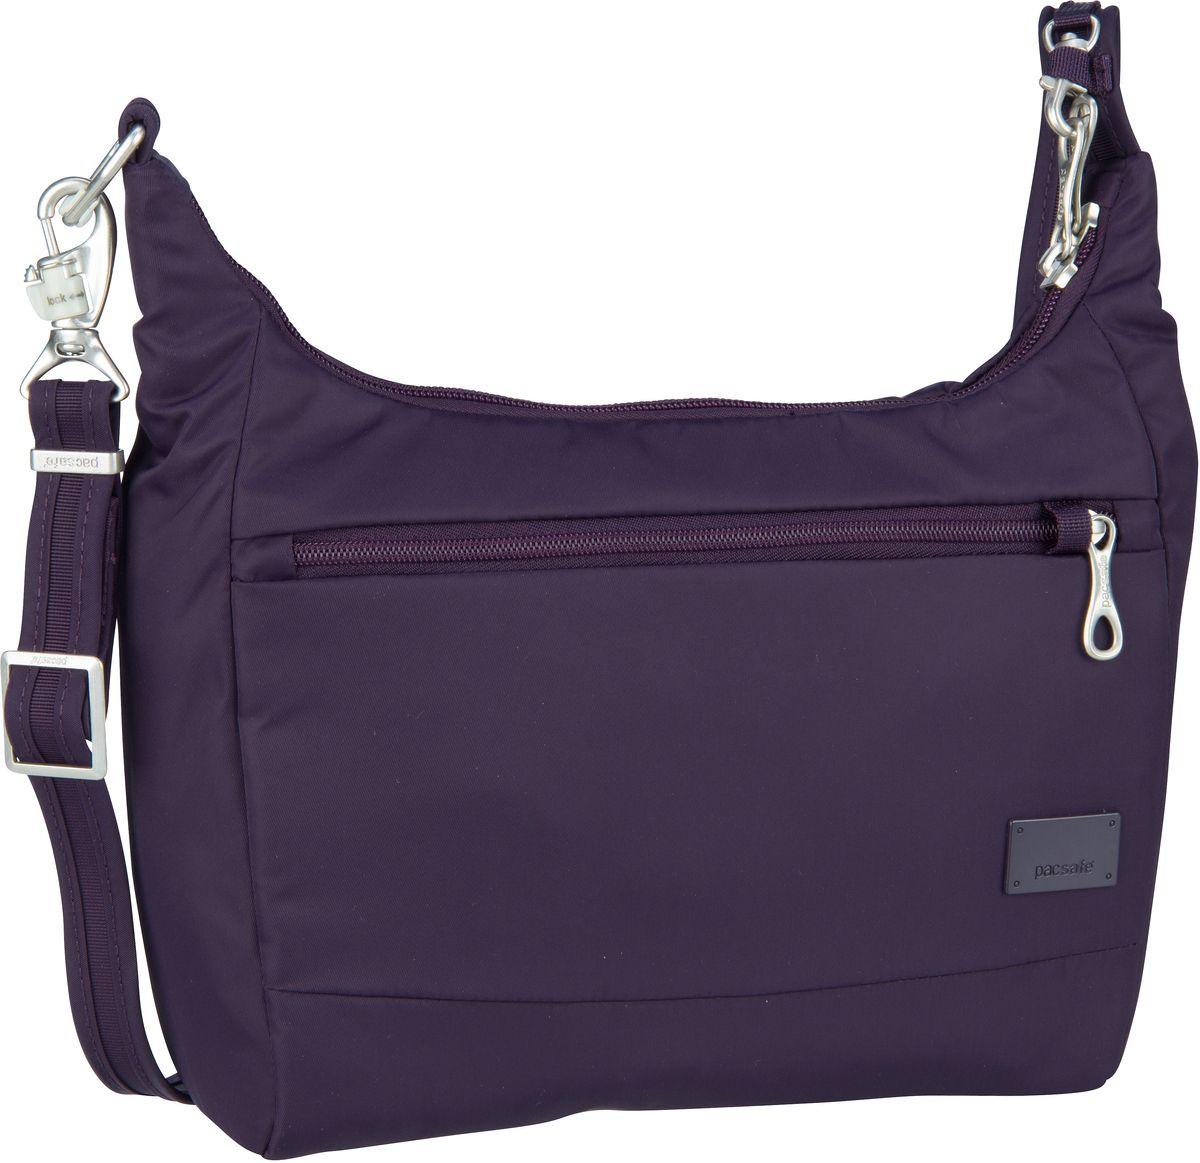 Pacsafe Umhängetasche Stylesafe CS100 Handbag (5 Liter)